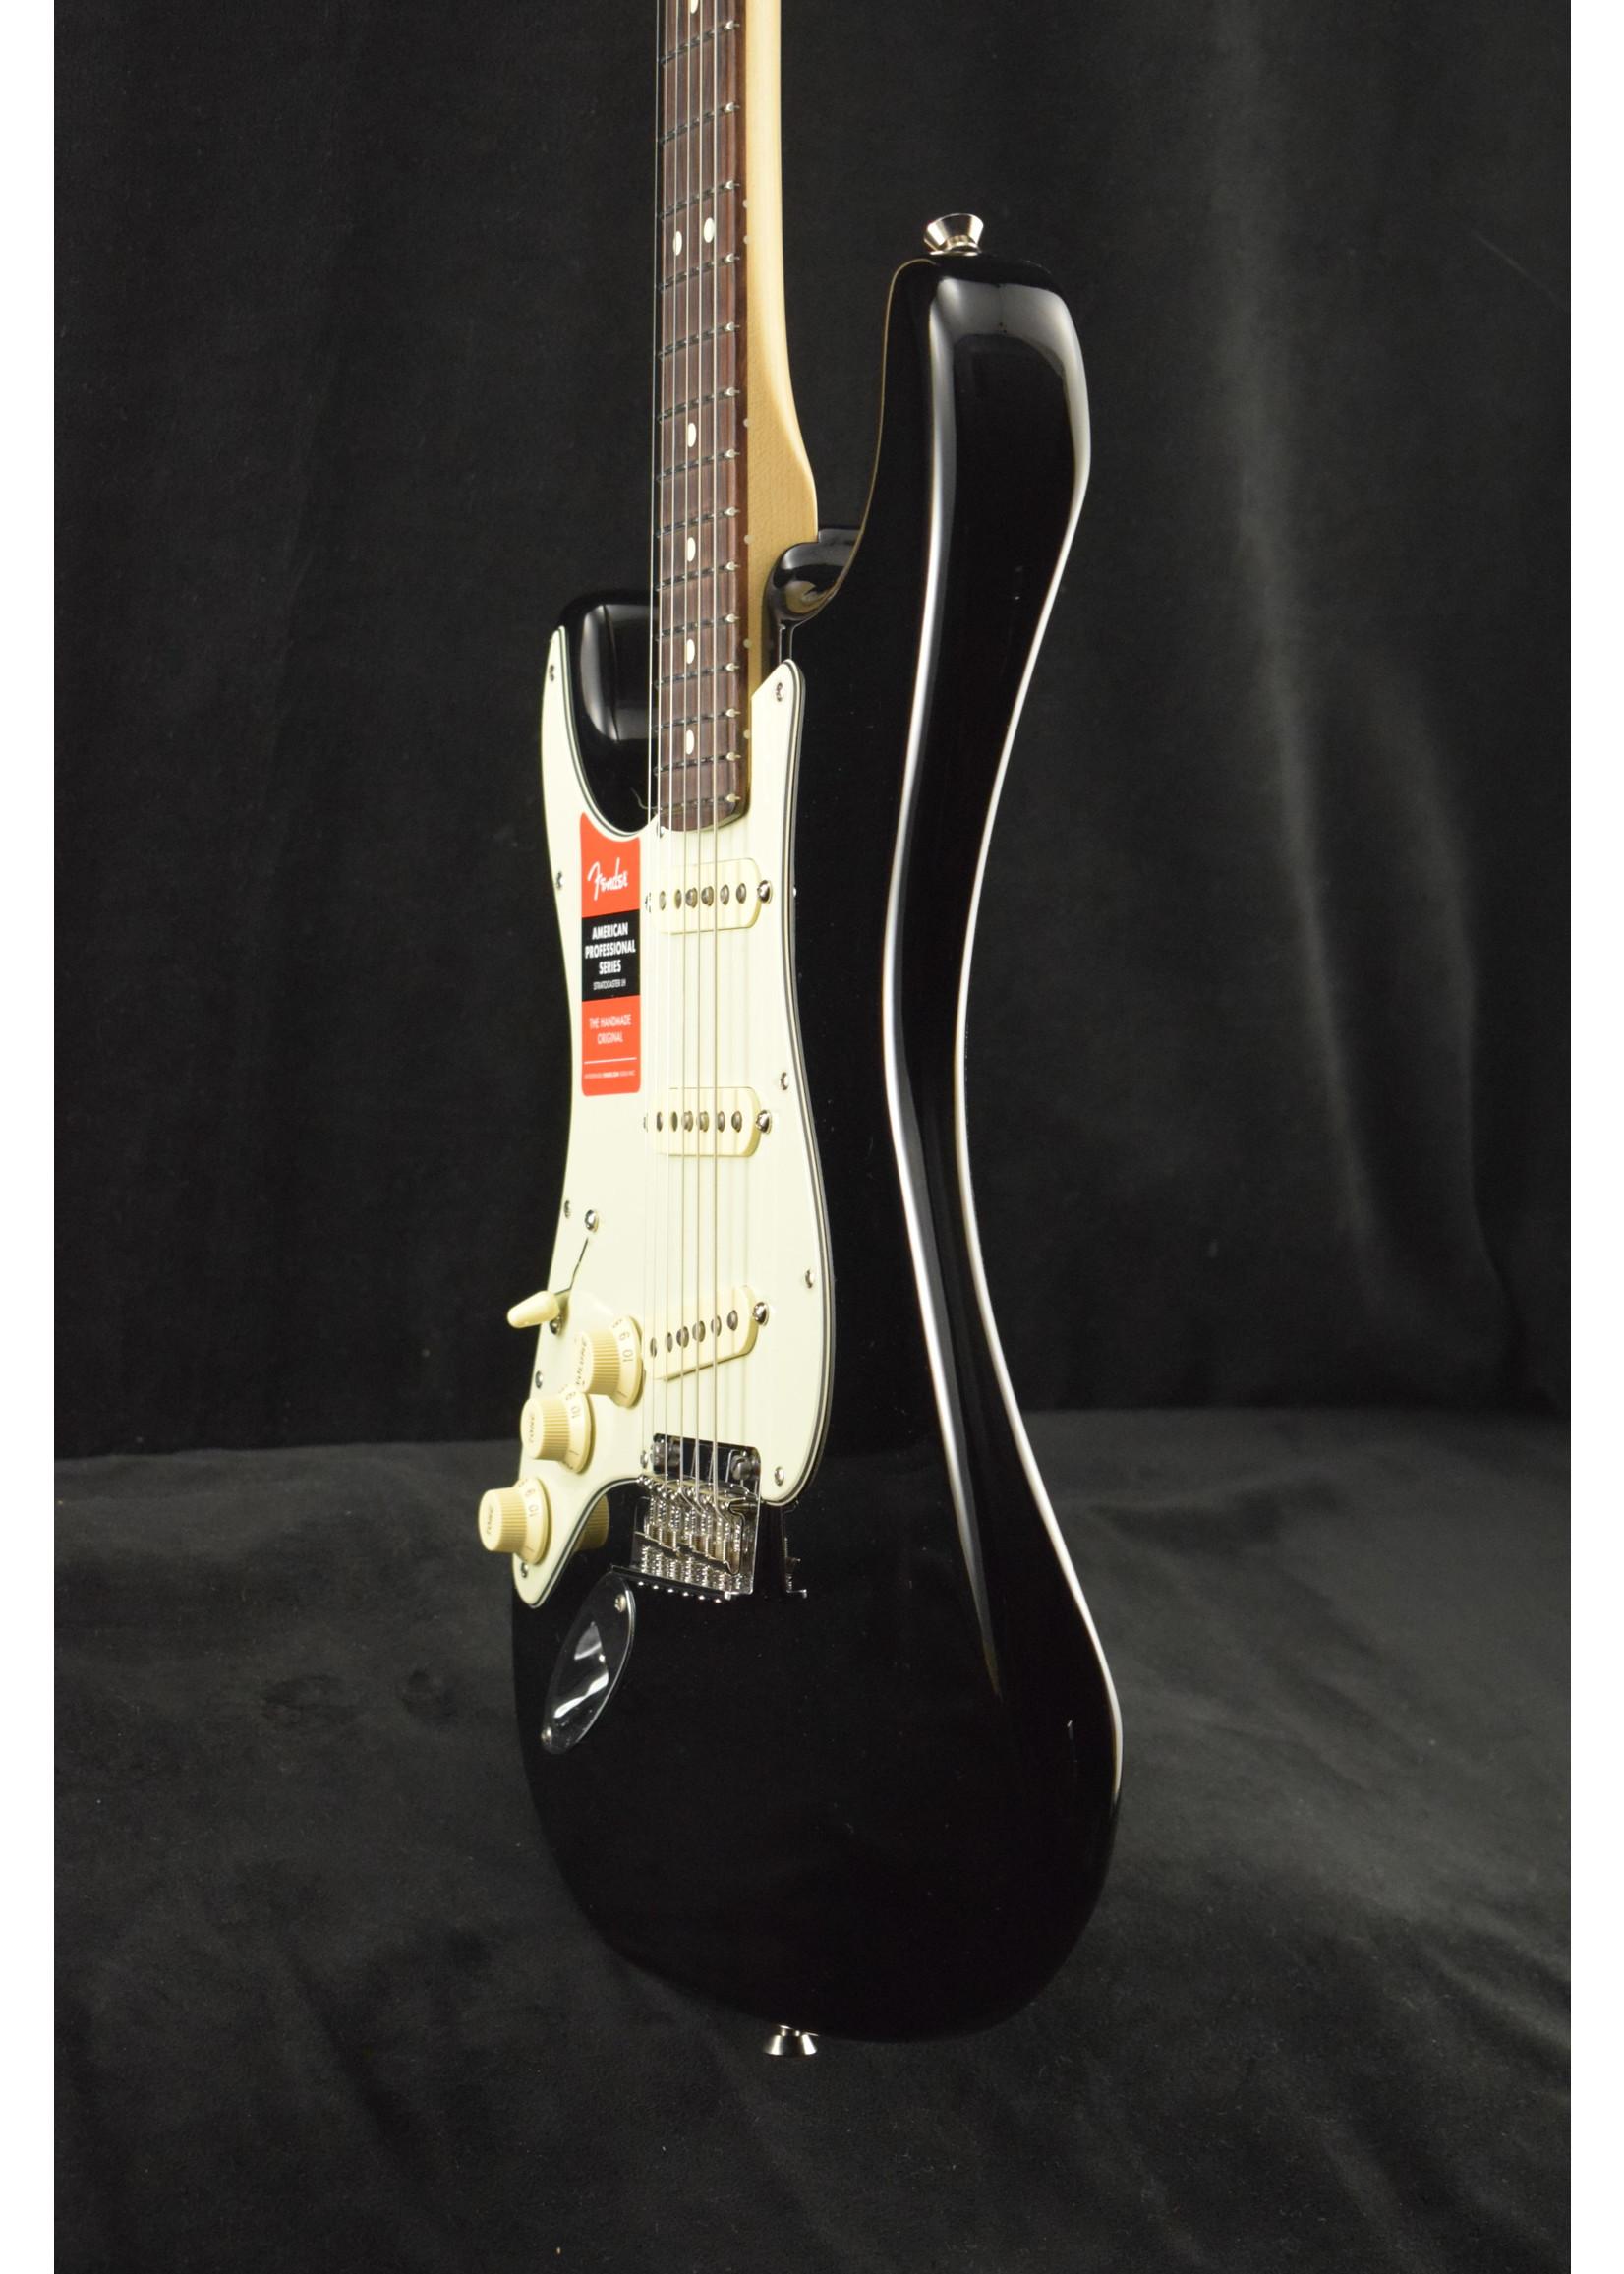 Fender Fender American Professional Stratocaster Left-Hand RW Black